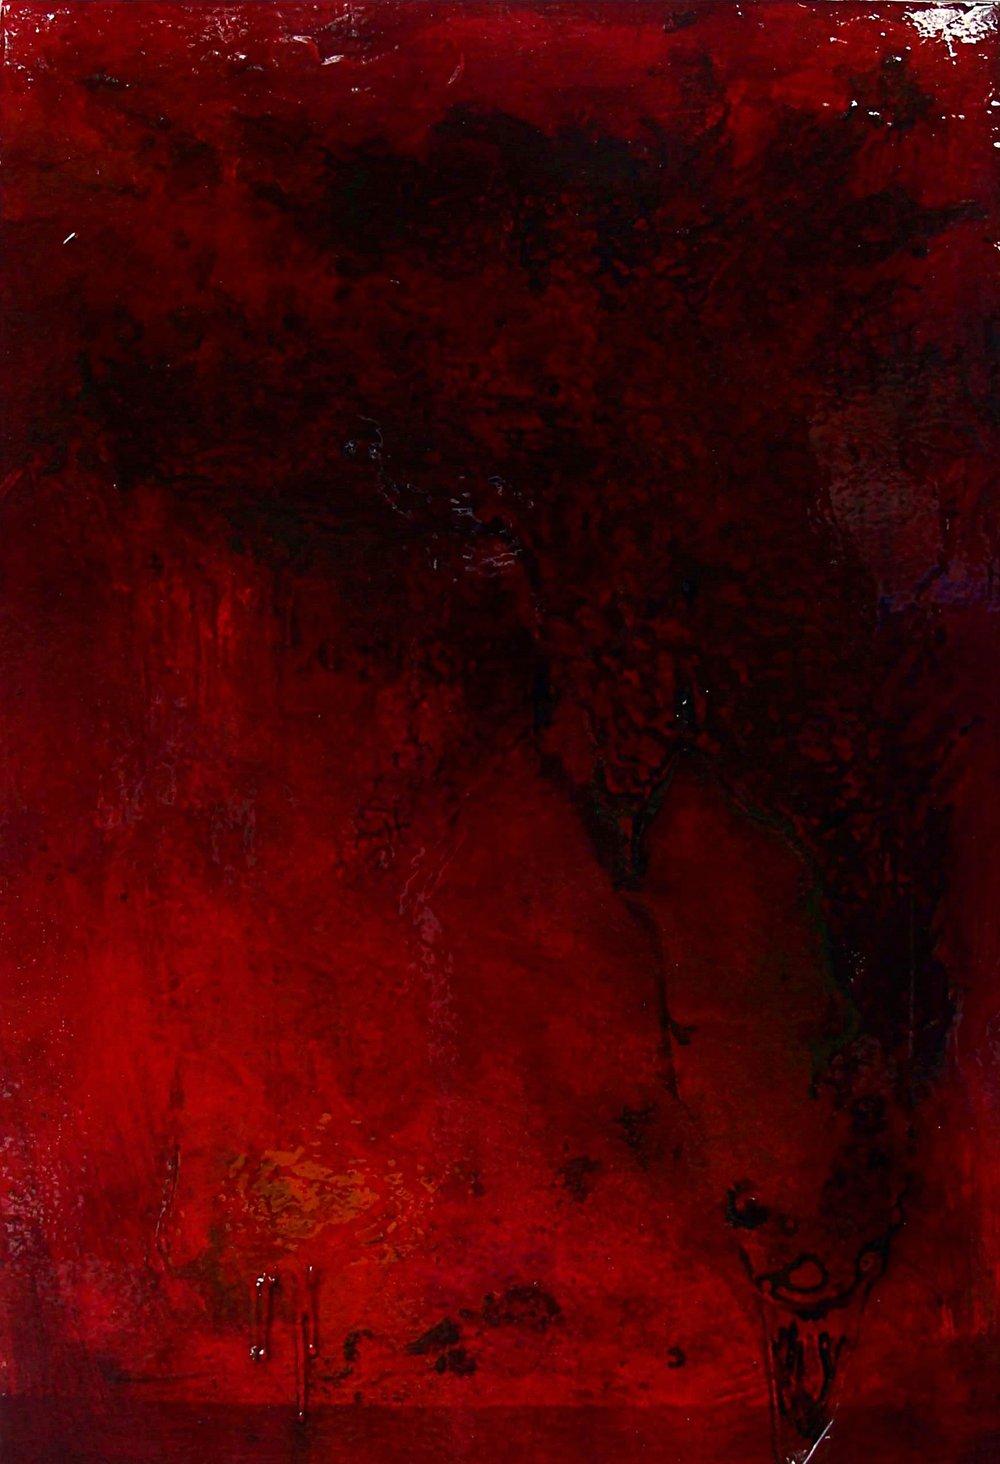 Corporeal 7 oil on canvas 60x90cm 2013-14